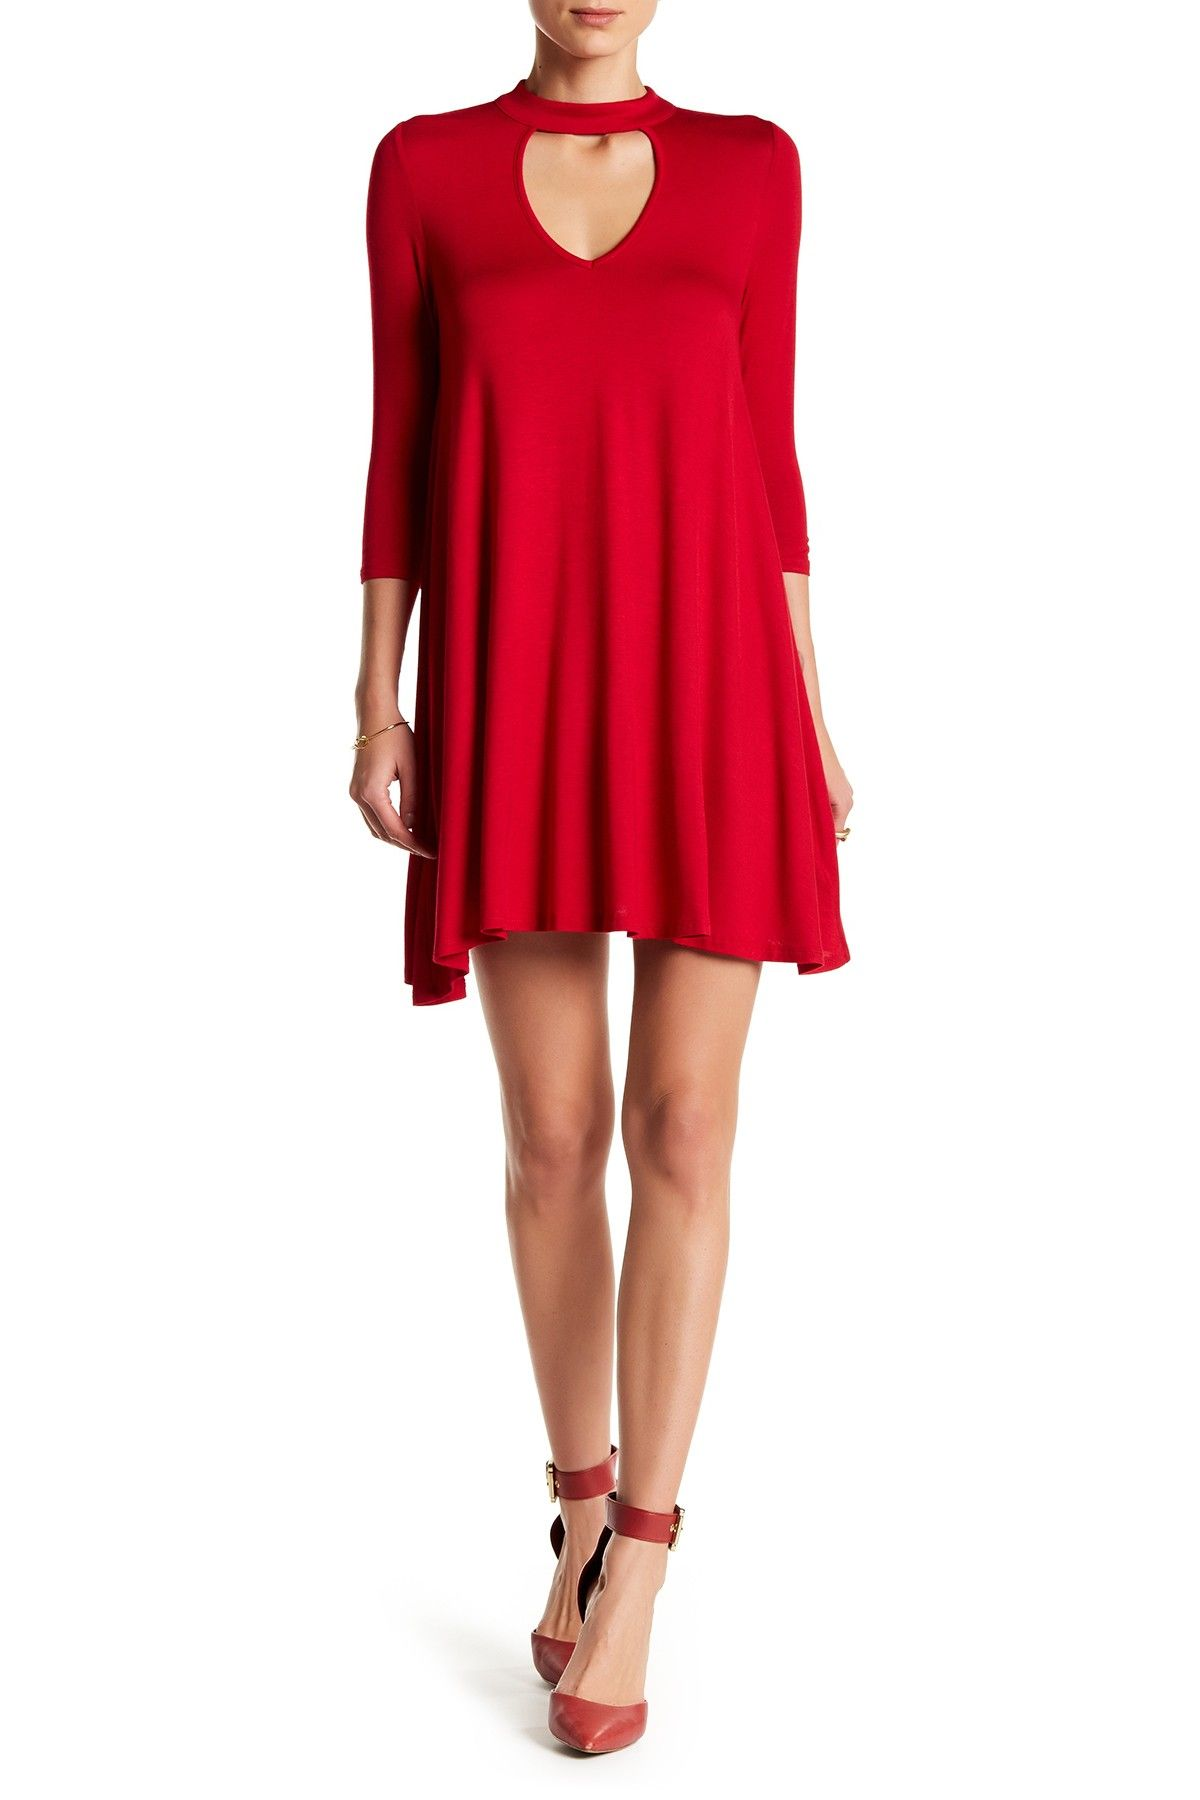 length sleeve knit gigi dress pinterest gigi dress and products